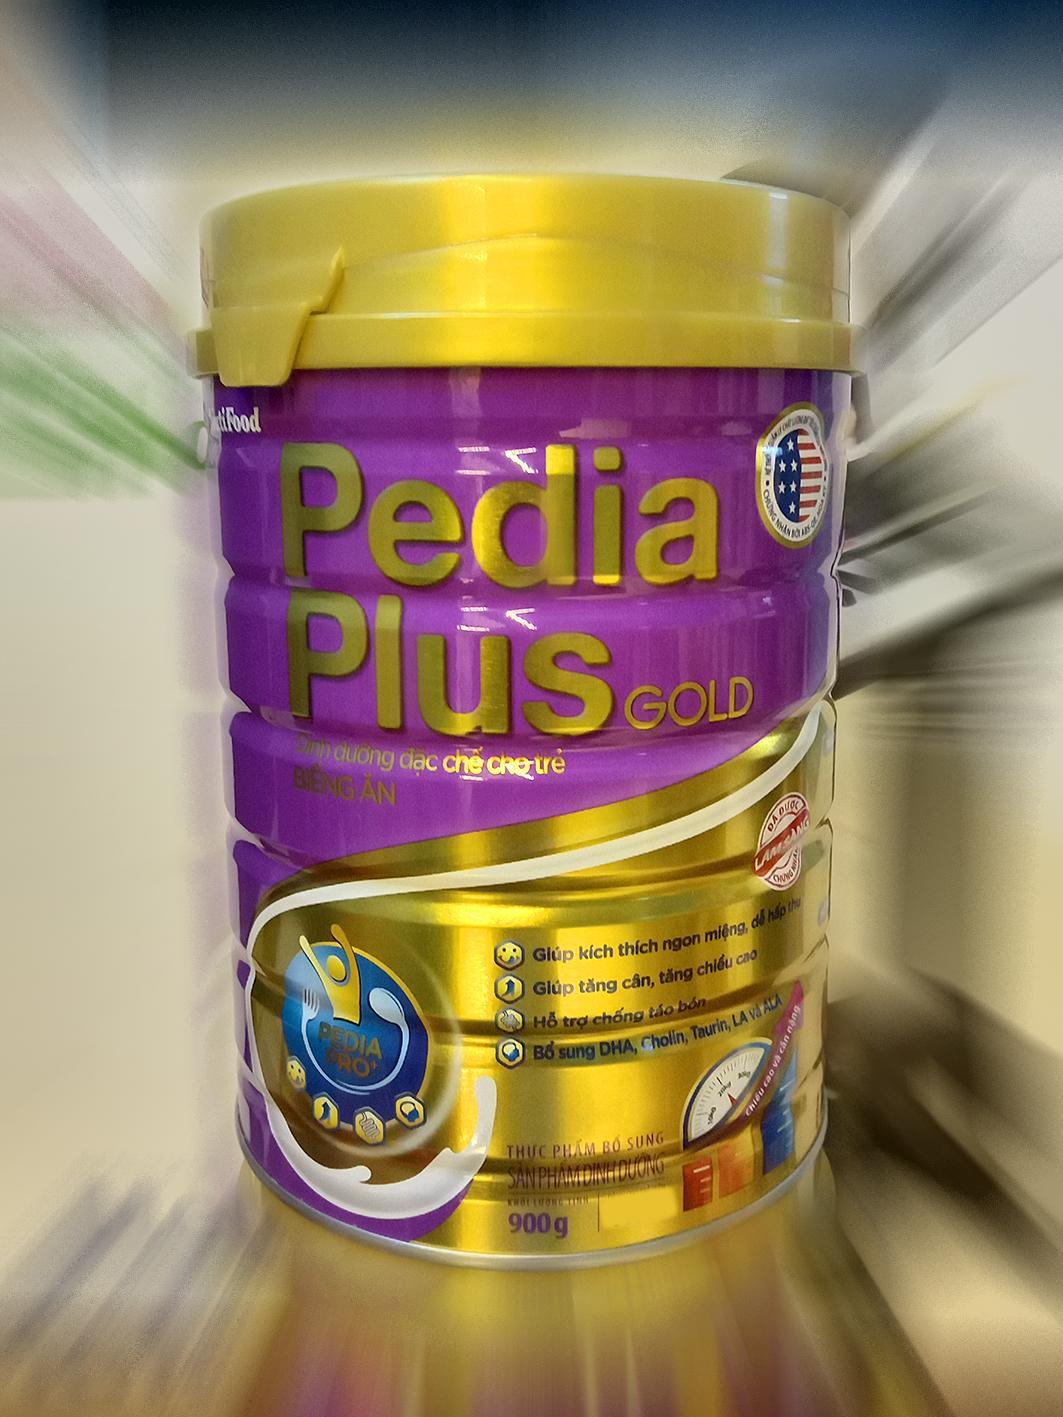 Sữa Nutifood Pedia plus gold cho trẻ biếng ăn loại 900g